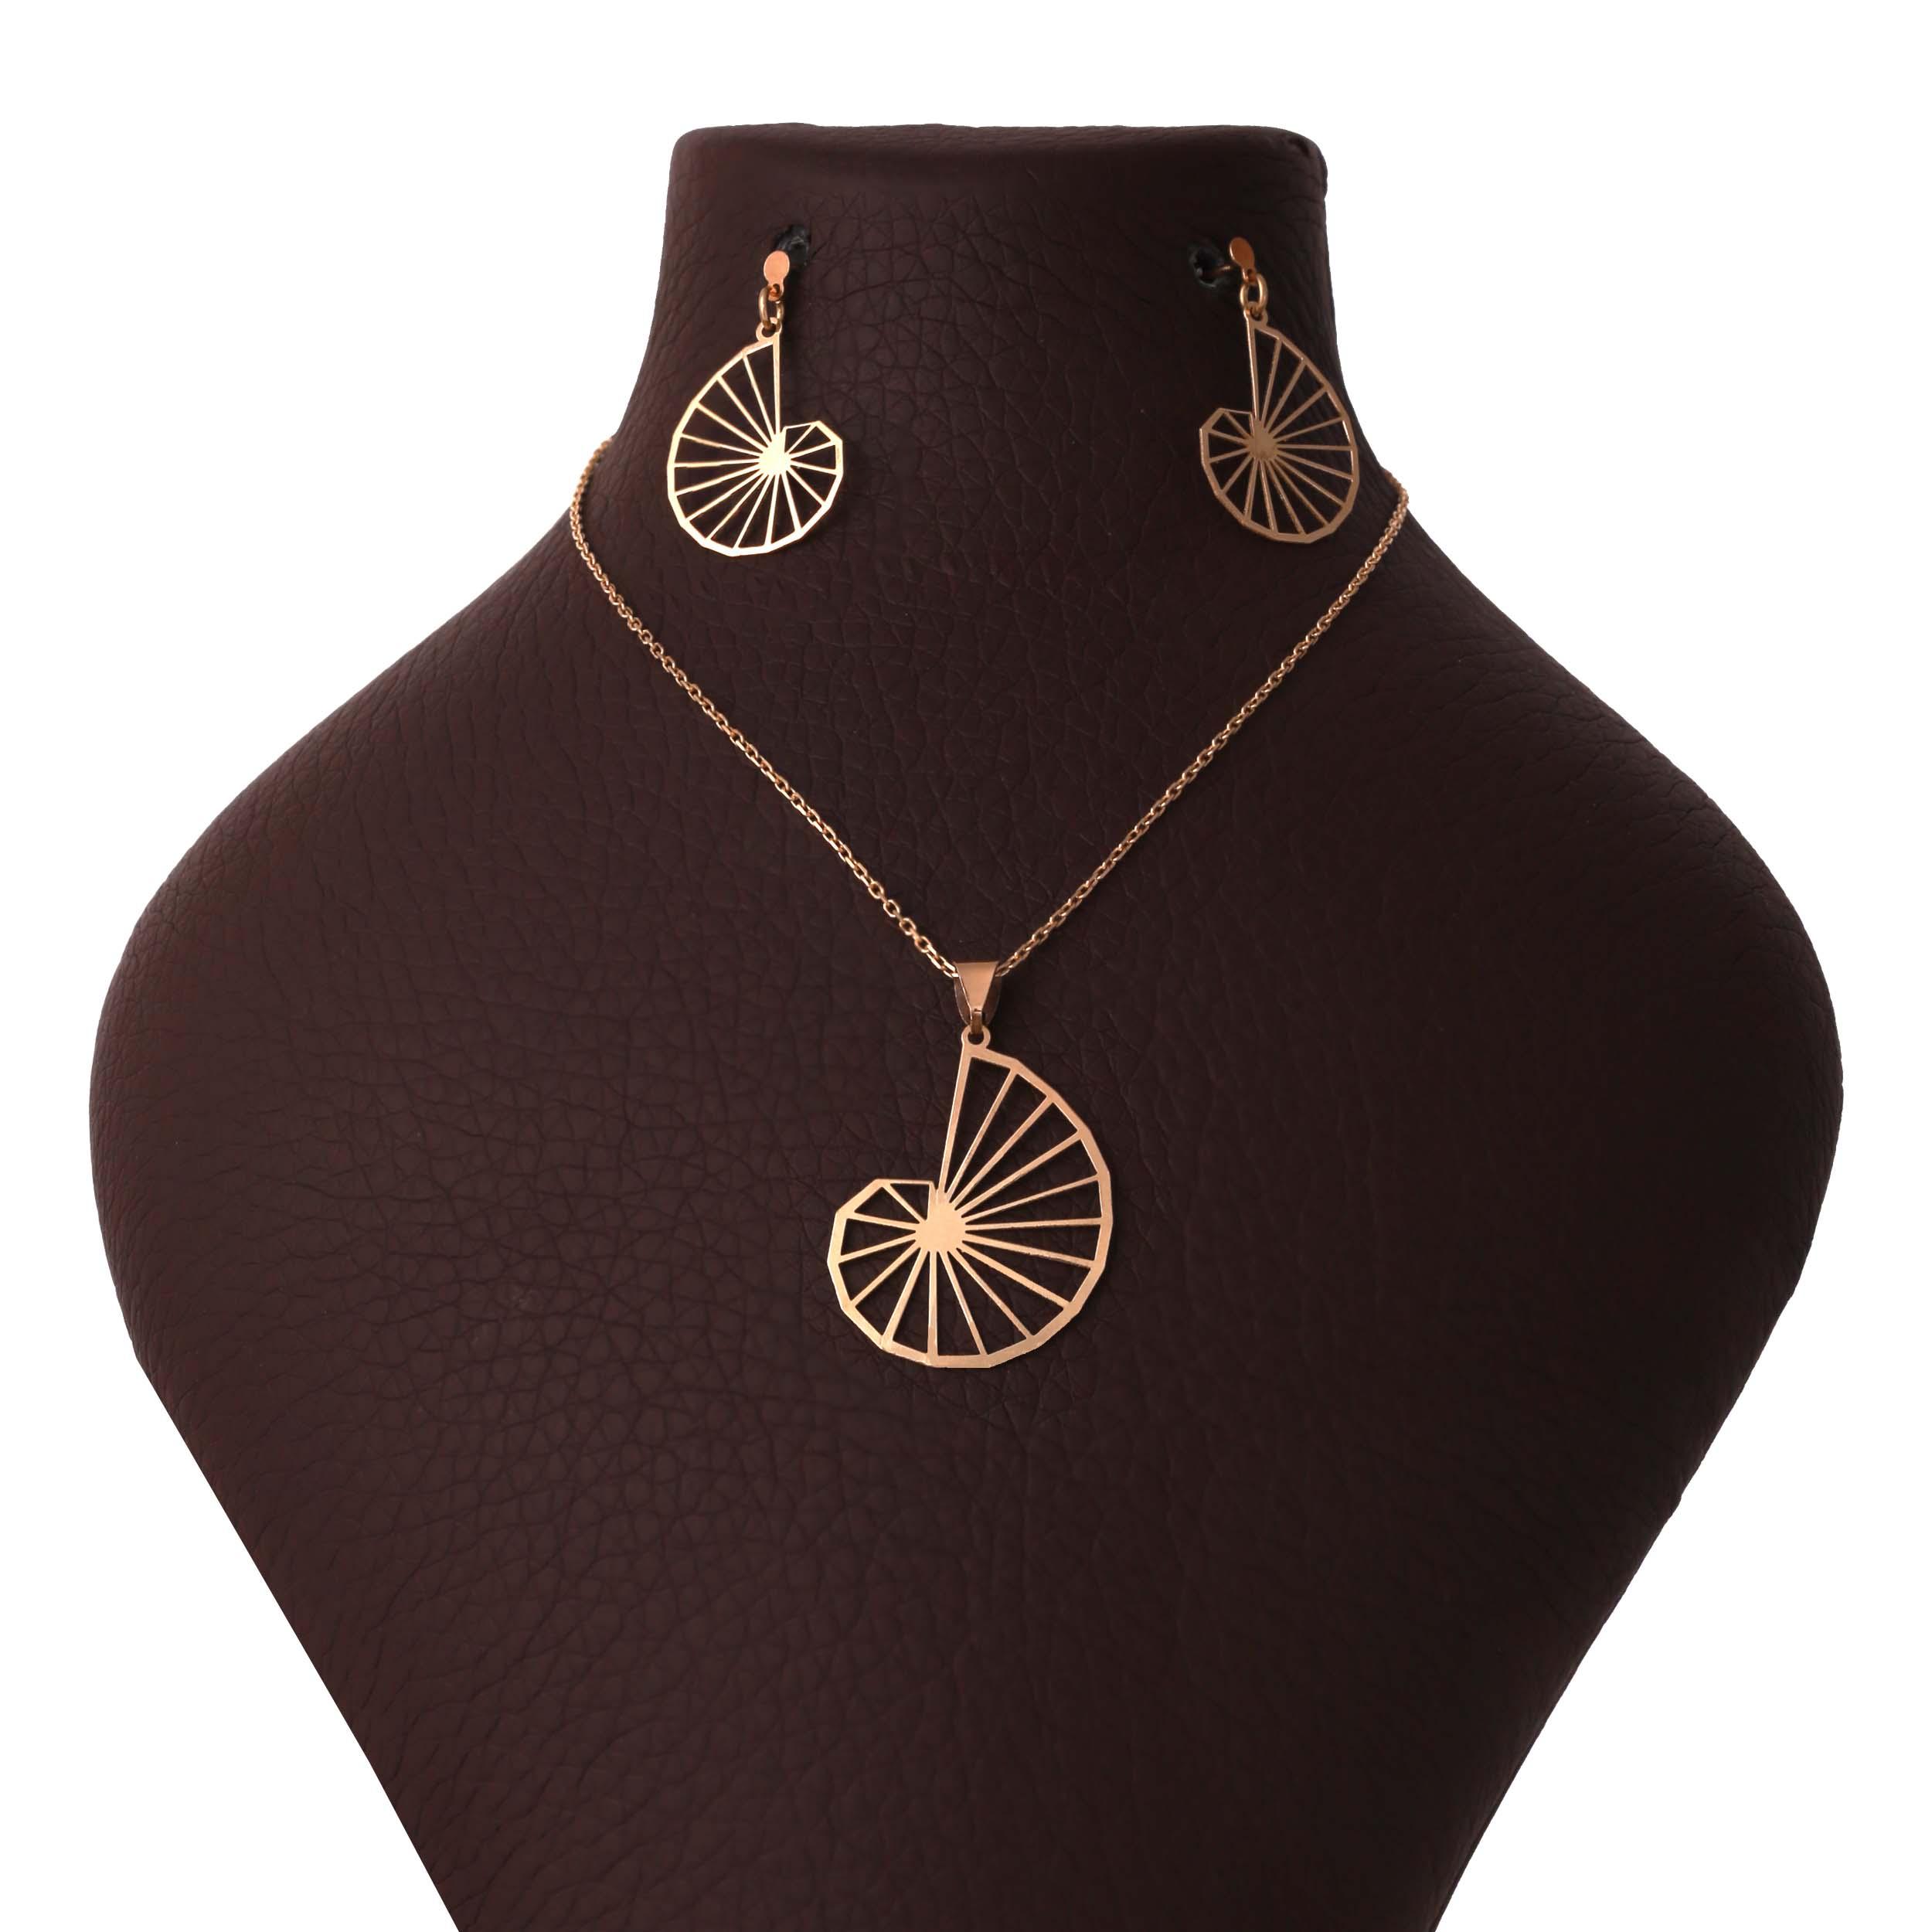 نیم ست طلا 18 عیار زنانه آمانژ طرح اسپیرال کد 1170D9094